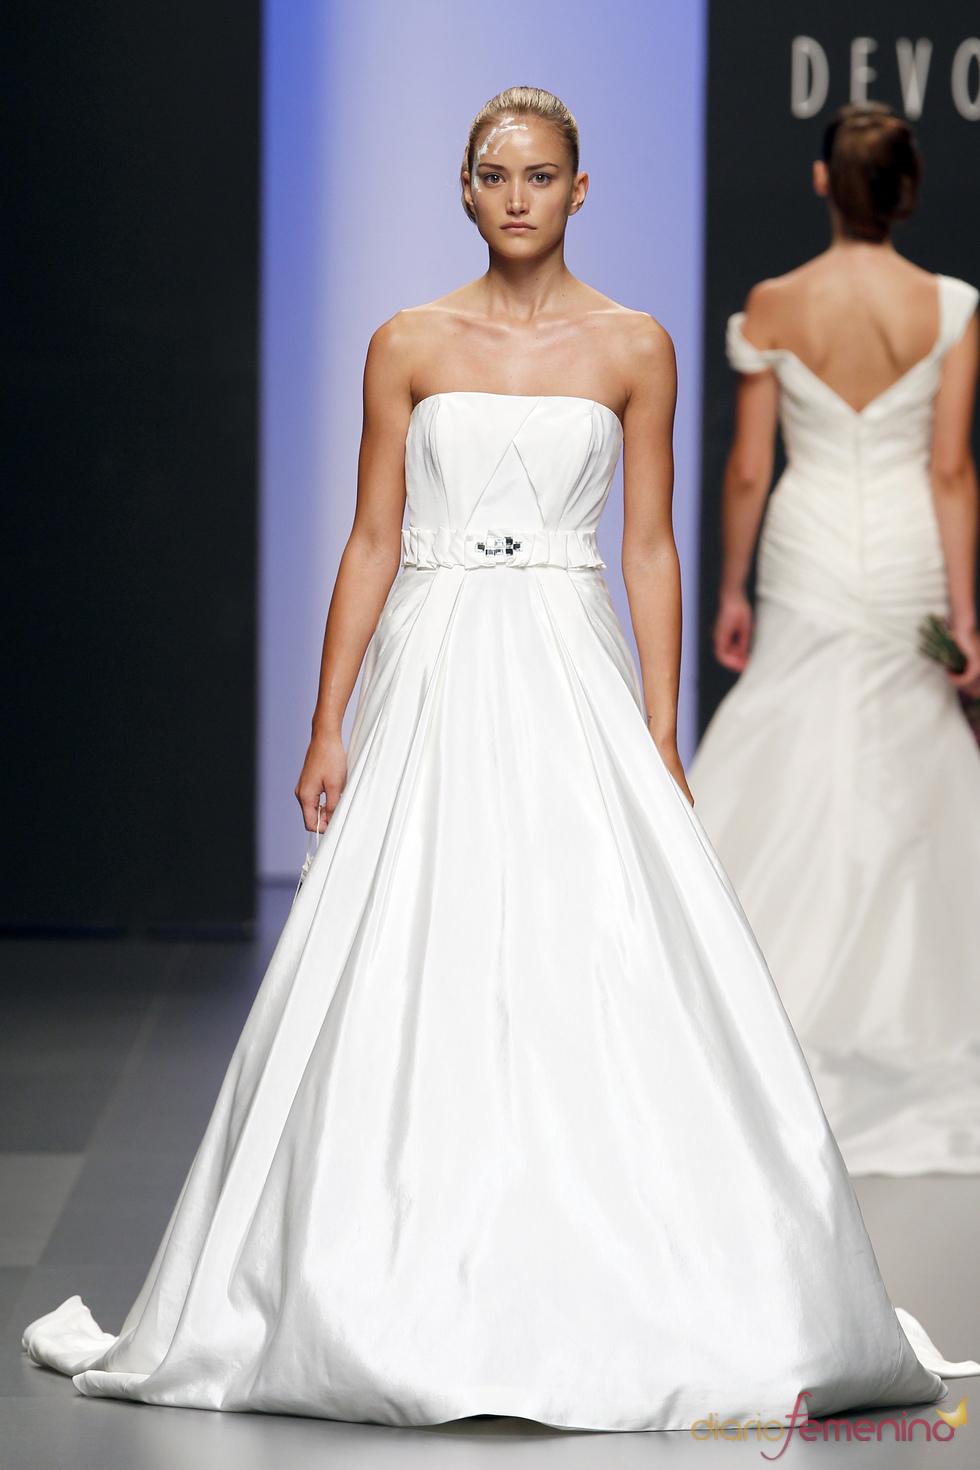 Vestido de novia palabra de honor de Devota&Lomba